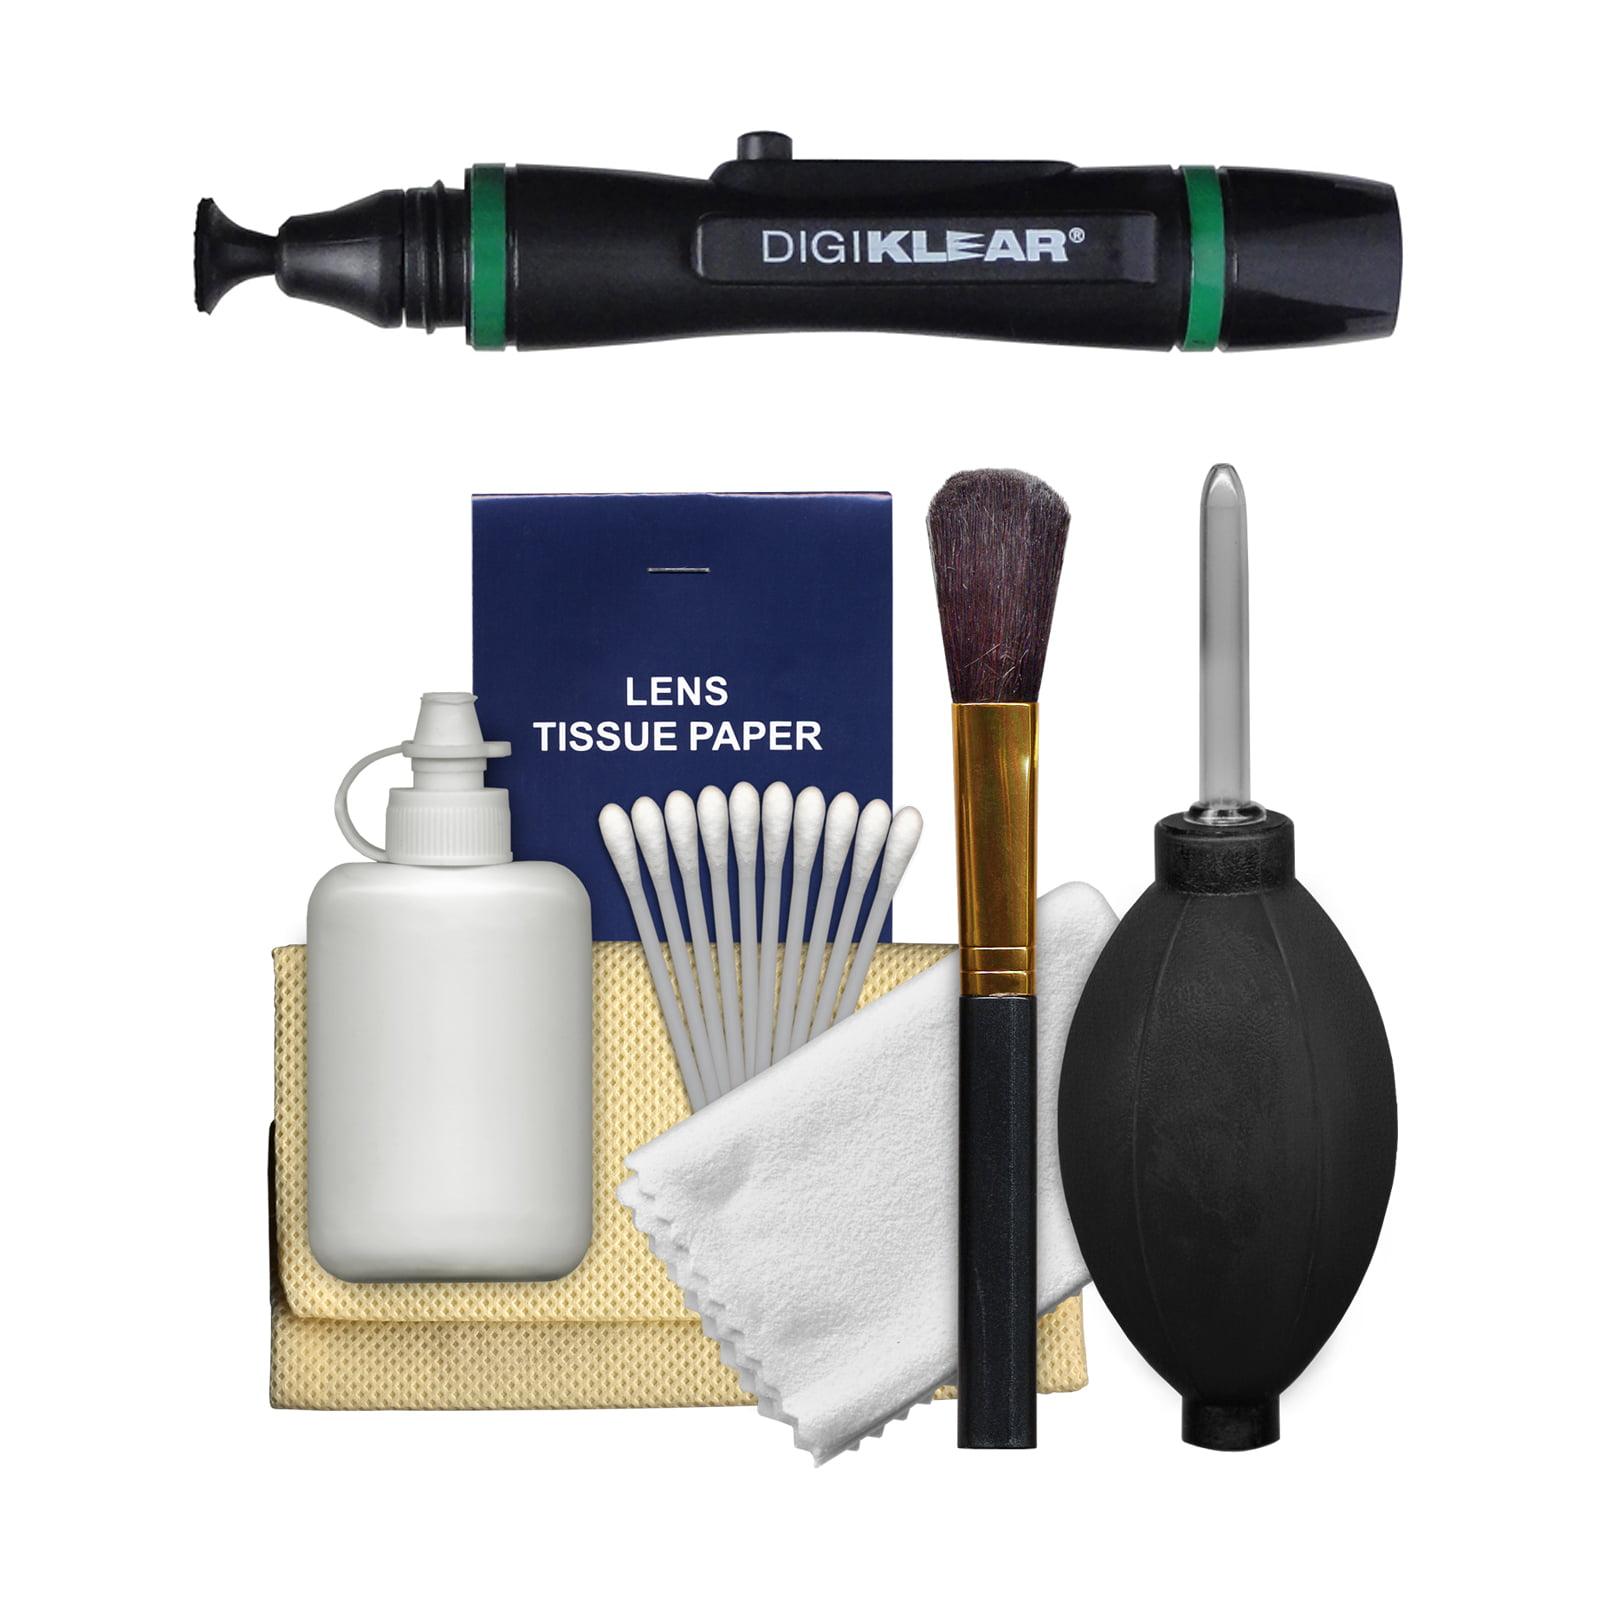 LensPen DigiKlear DK-1 LCD Screen Cleaner + Precision Design Lens Cleaning Kit - for all Digital SLR Cameras & Compact Digital Cameras